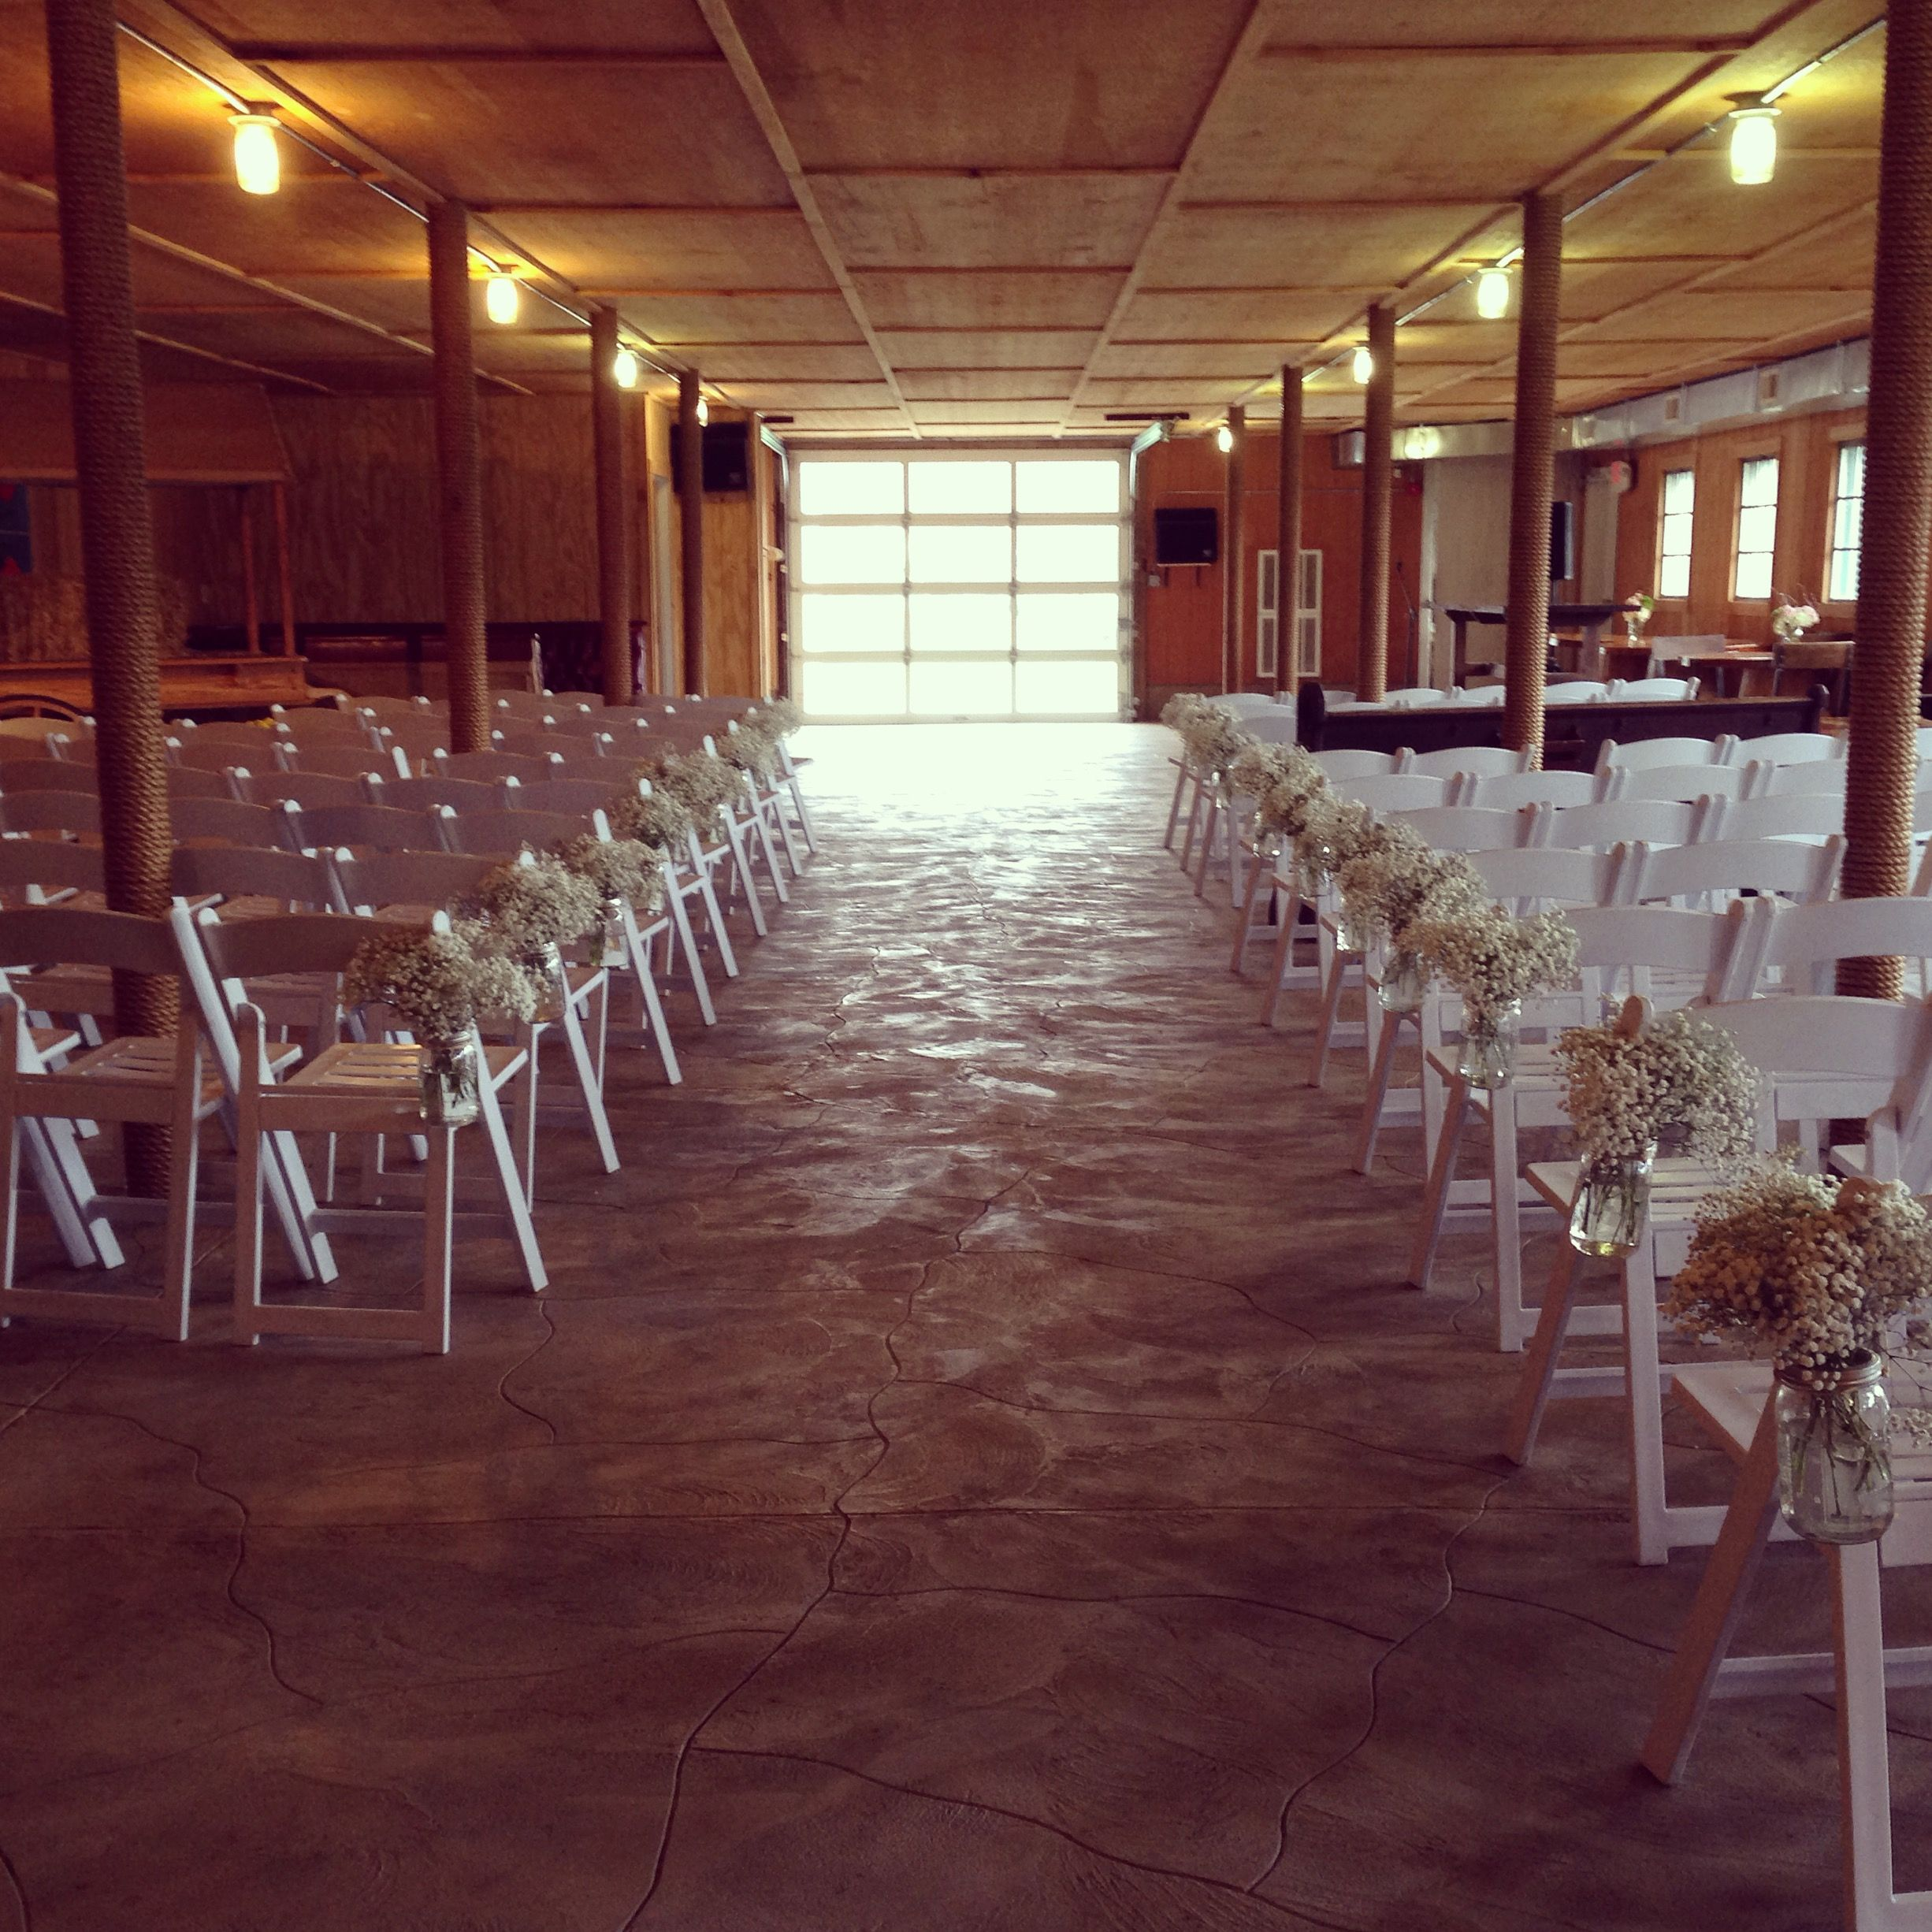 Indoor Wedding Ceremony Victoria Bc: Indoor Ceremony Downstairs In The Barn. #ceremony #barn